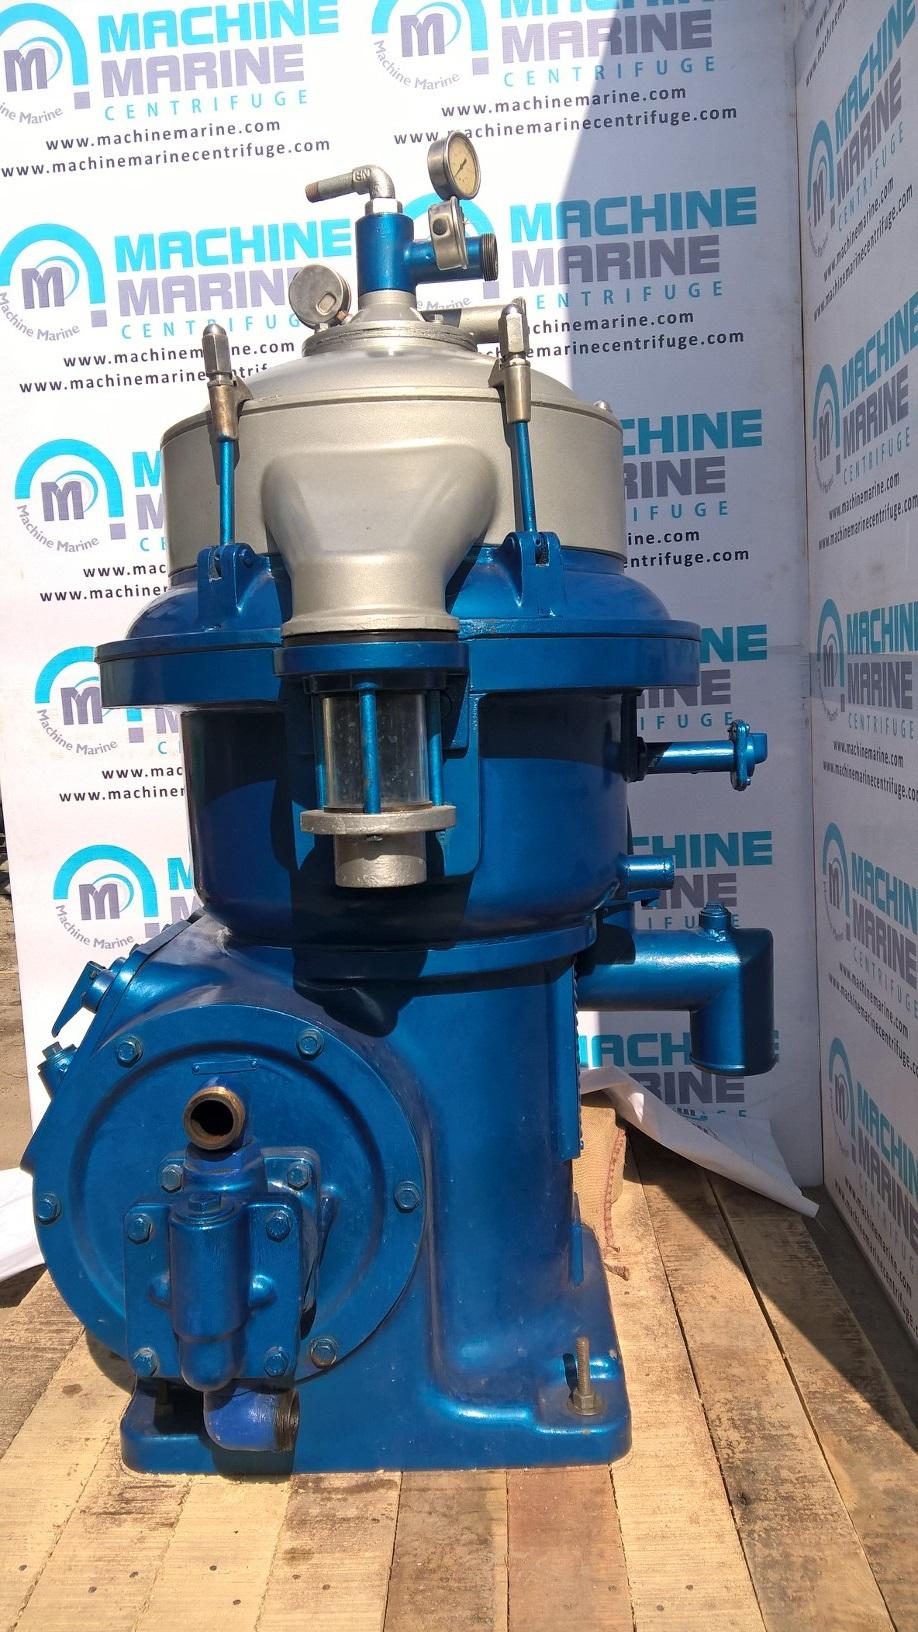 alfa laval mopx 207 oil purifier alfa laval centrifuge rh machinemarinecentrifuge com Fuel Oil Furnace Fuel Oil Types